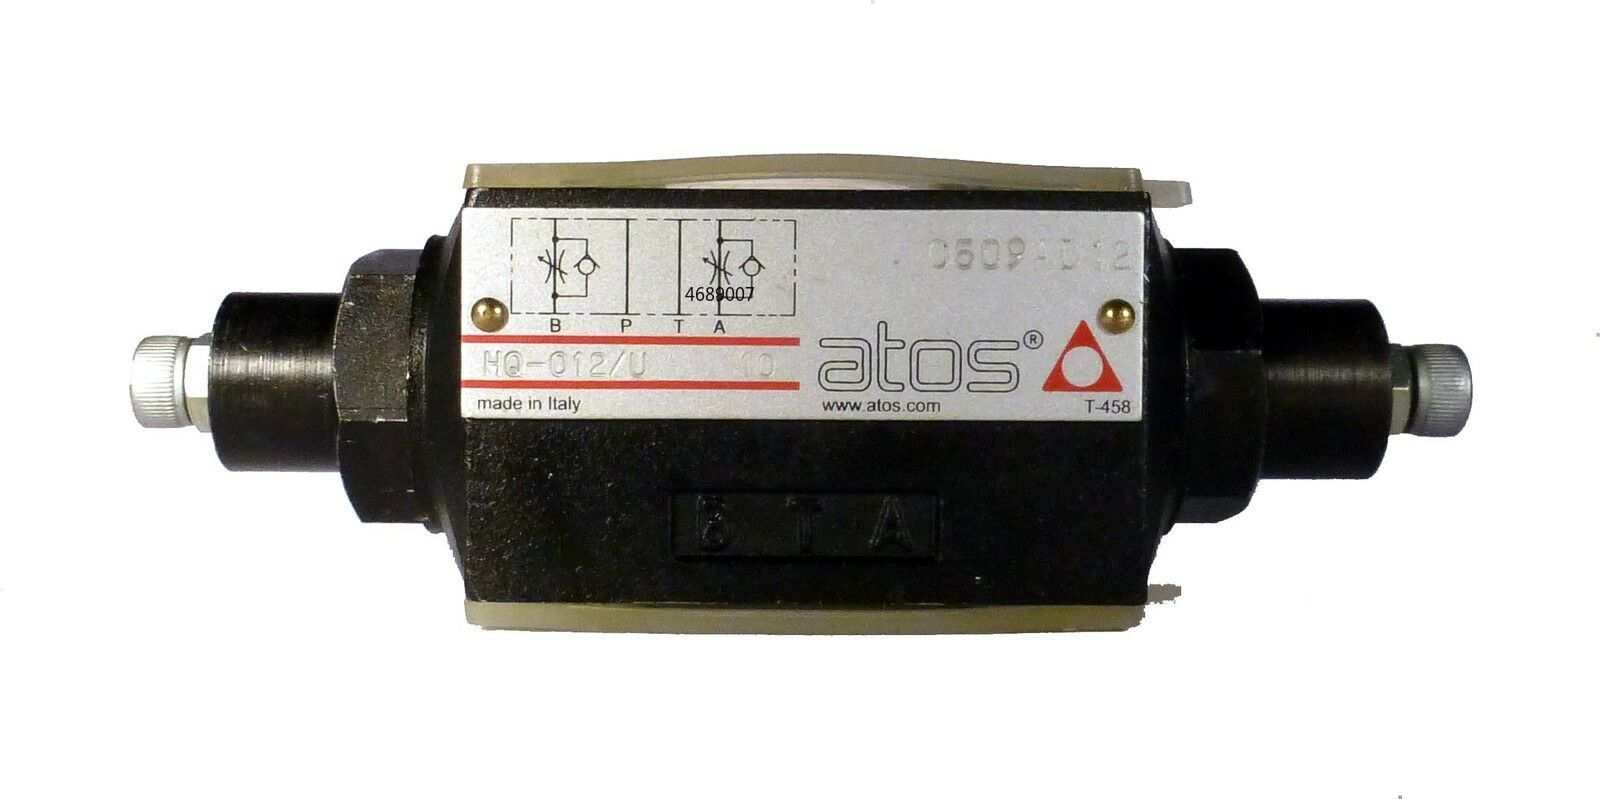 اتوس HQ-012/u 10 Zwischenplatten Ventil Drossel وحدات خنق صمام HQ-012